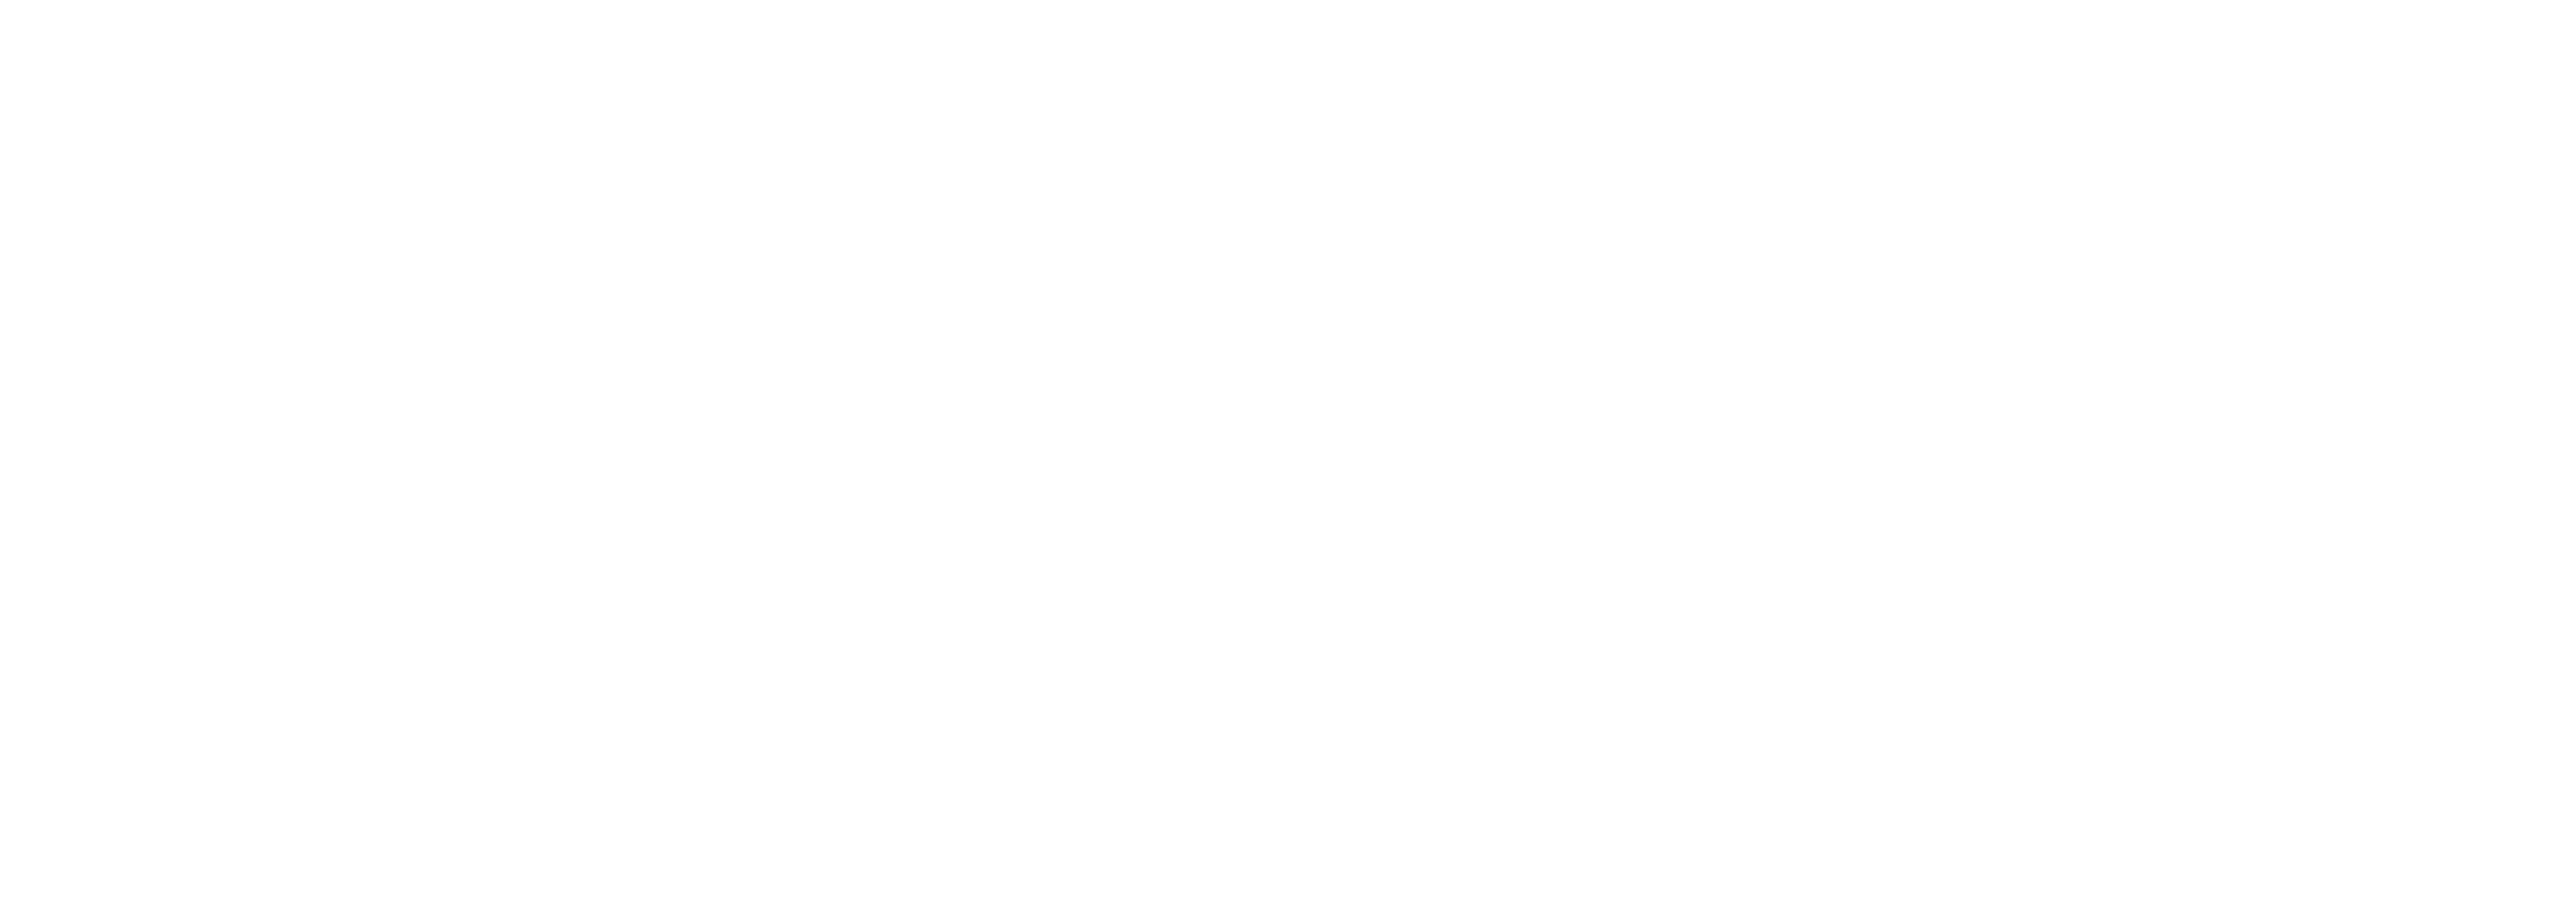 line sketch of hands raised